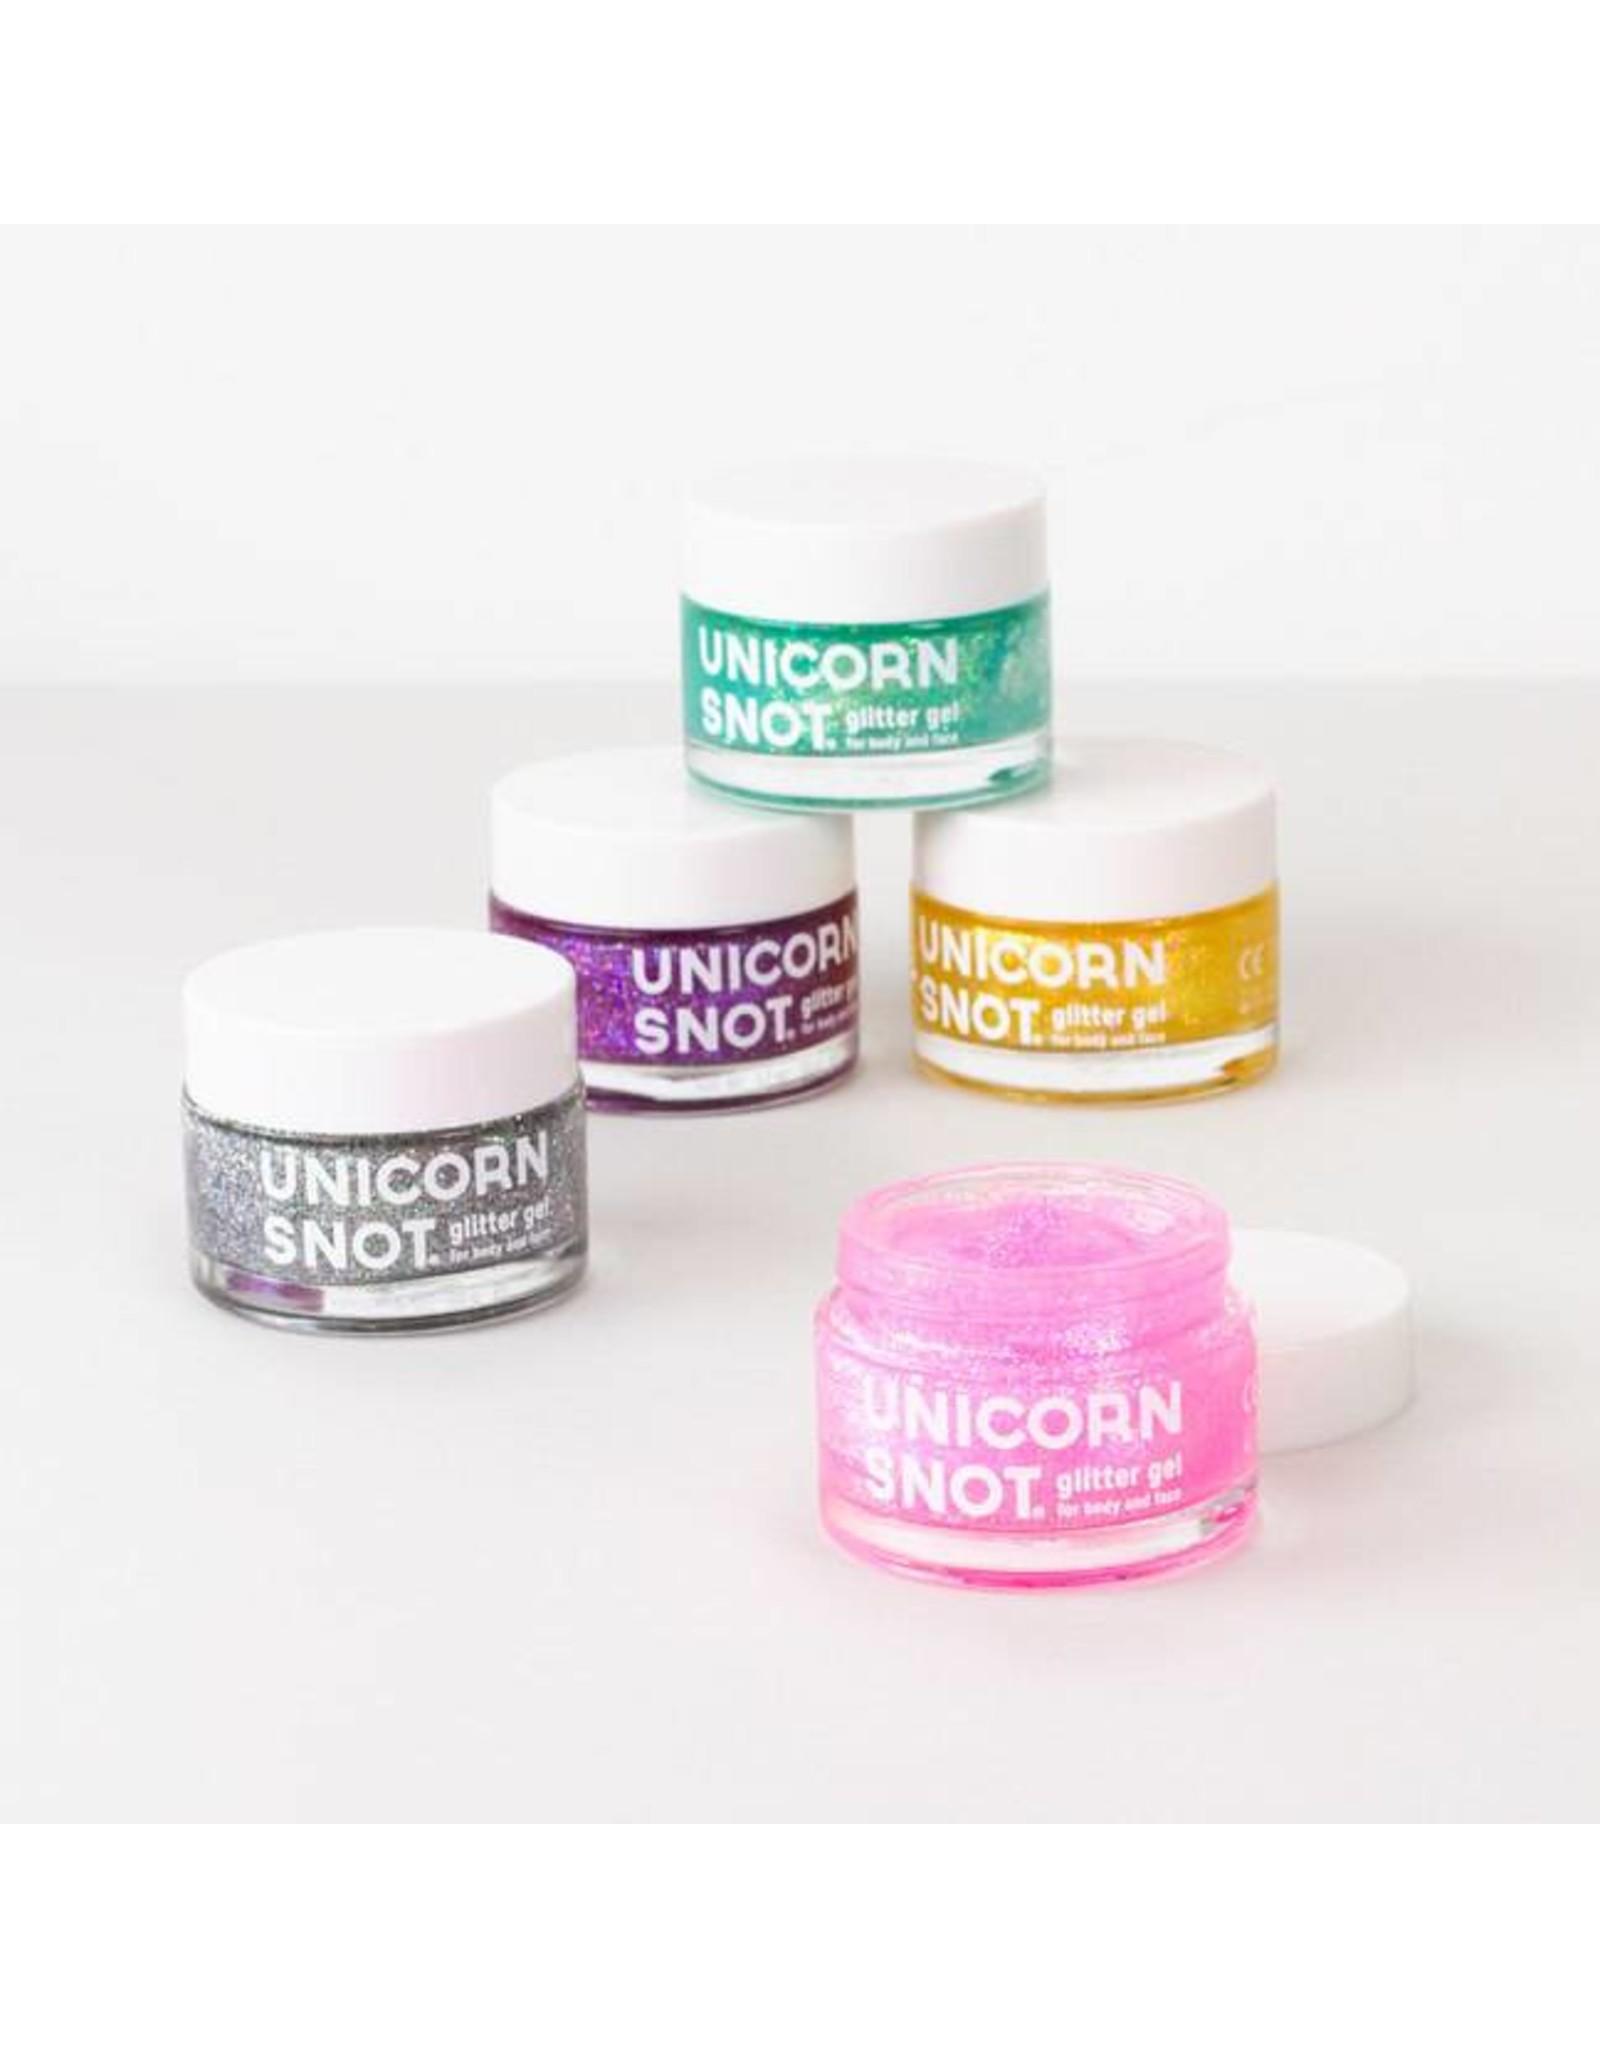 FCTRY Unicorn Snot